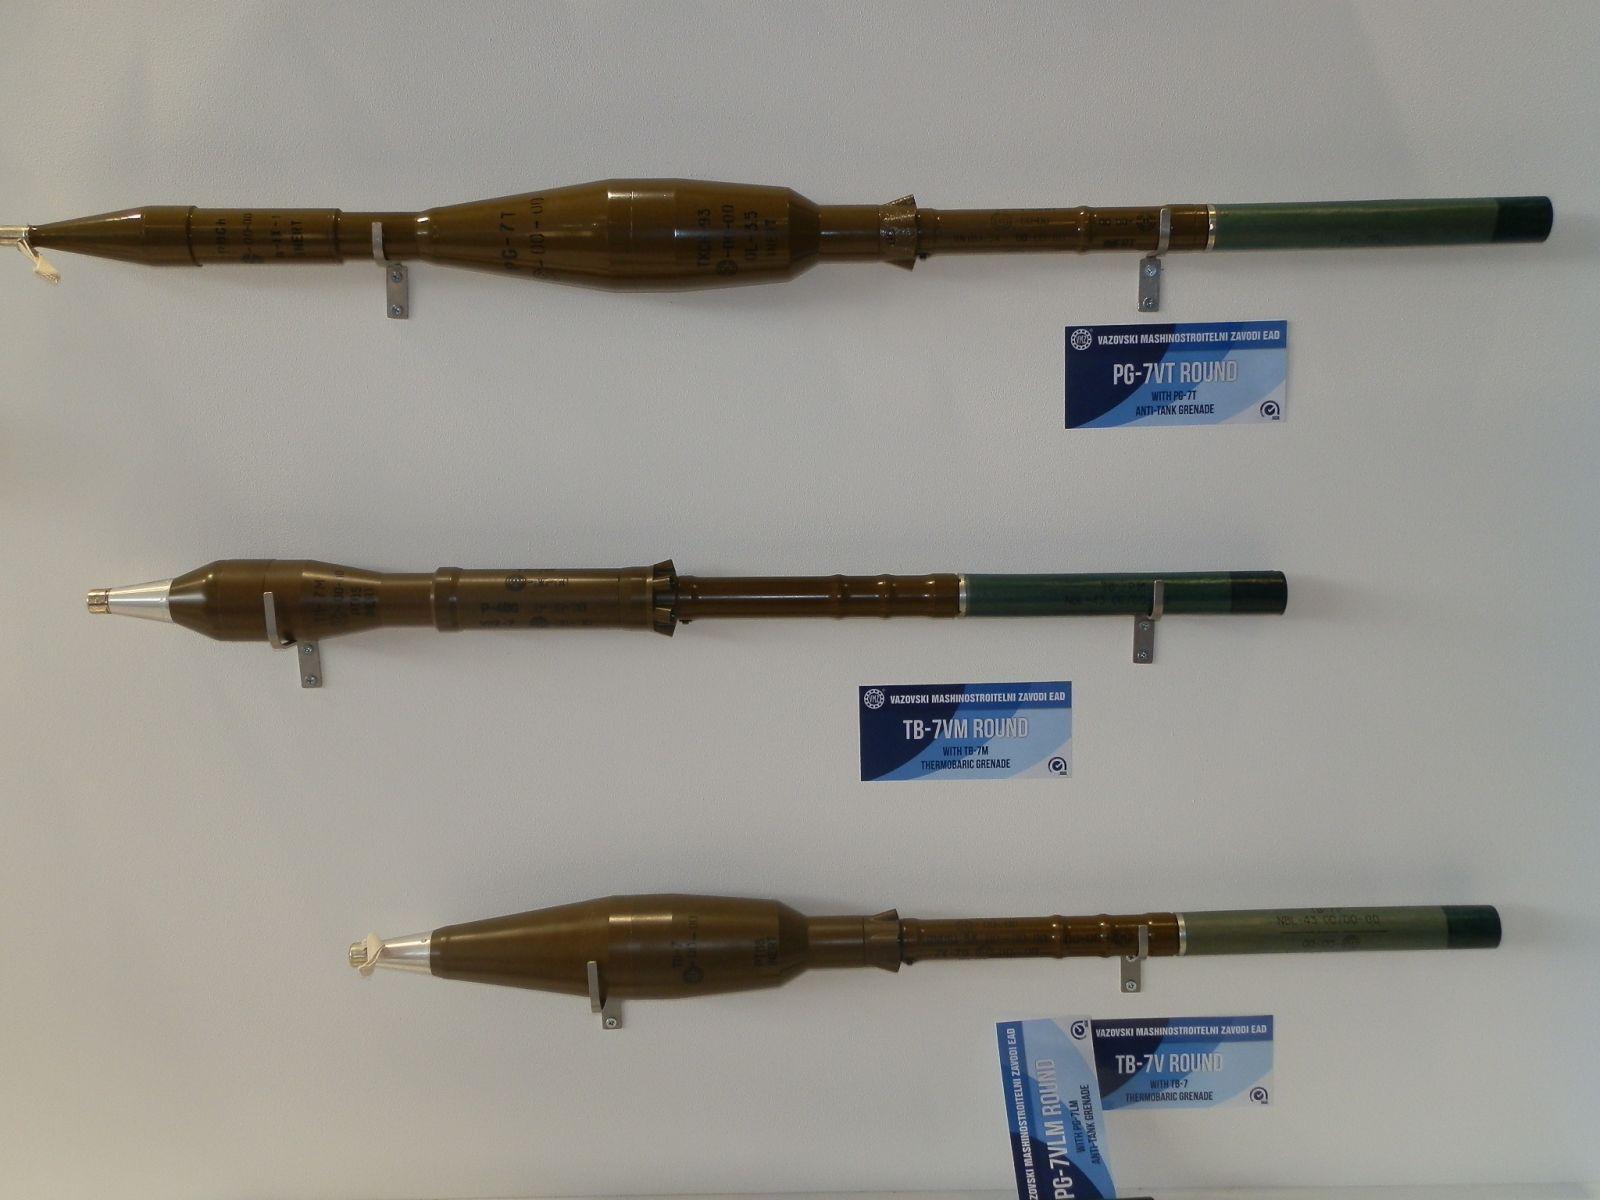 ХЕМУС 2020: ВМЗ с нов 155 mm снаряд, семейство БЛА, нов РПГ за еднократна употреба и изстрели за РПГ-7